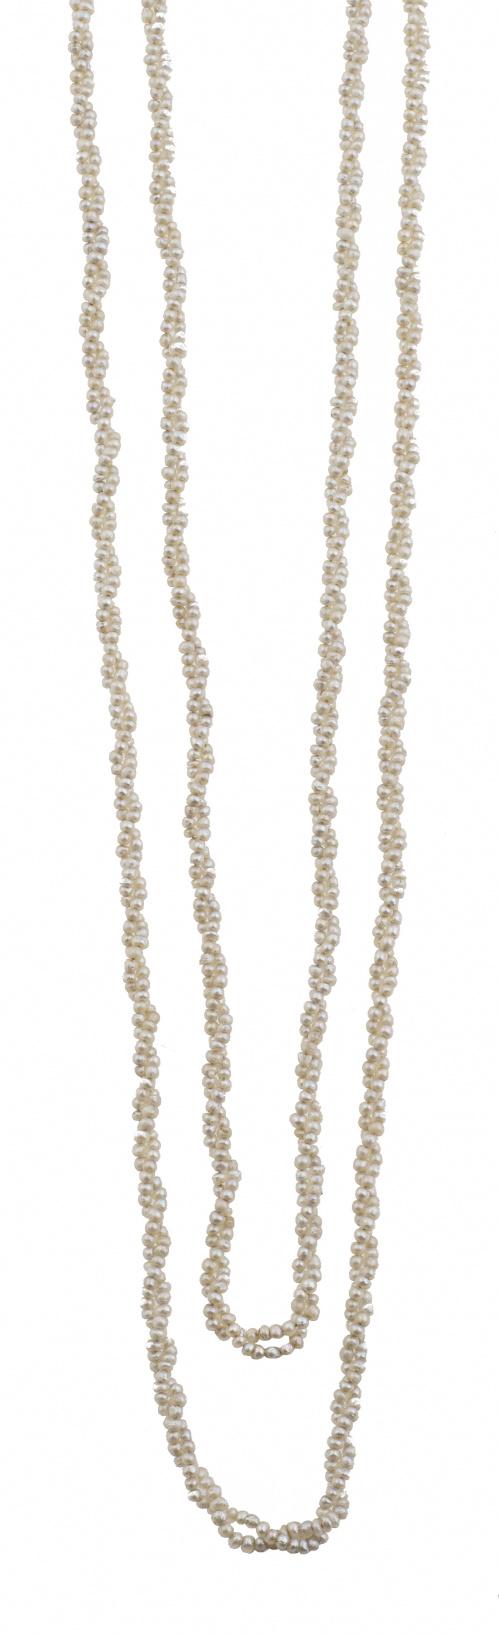 Collar de pp. S. XX con dos hilos de pequeñas perlas, proba